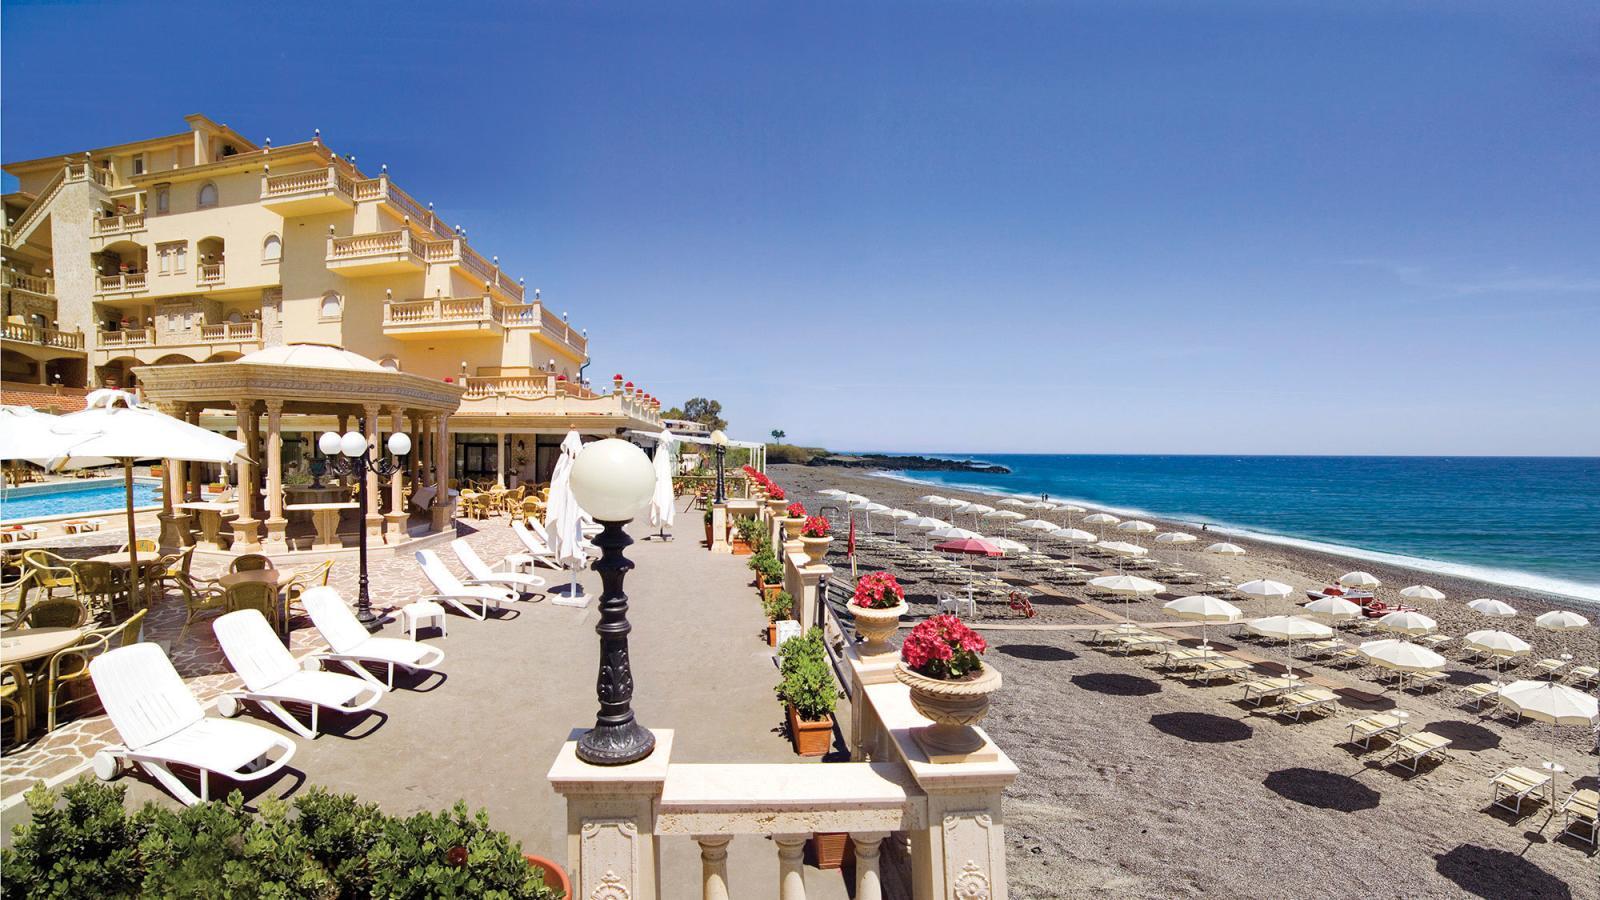 Giardini naxos holidays sicily holidays with topflight for Giardini naxos sicilia